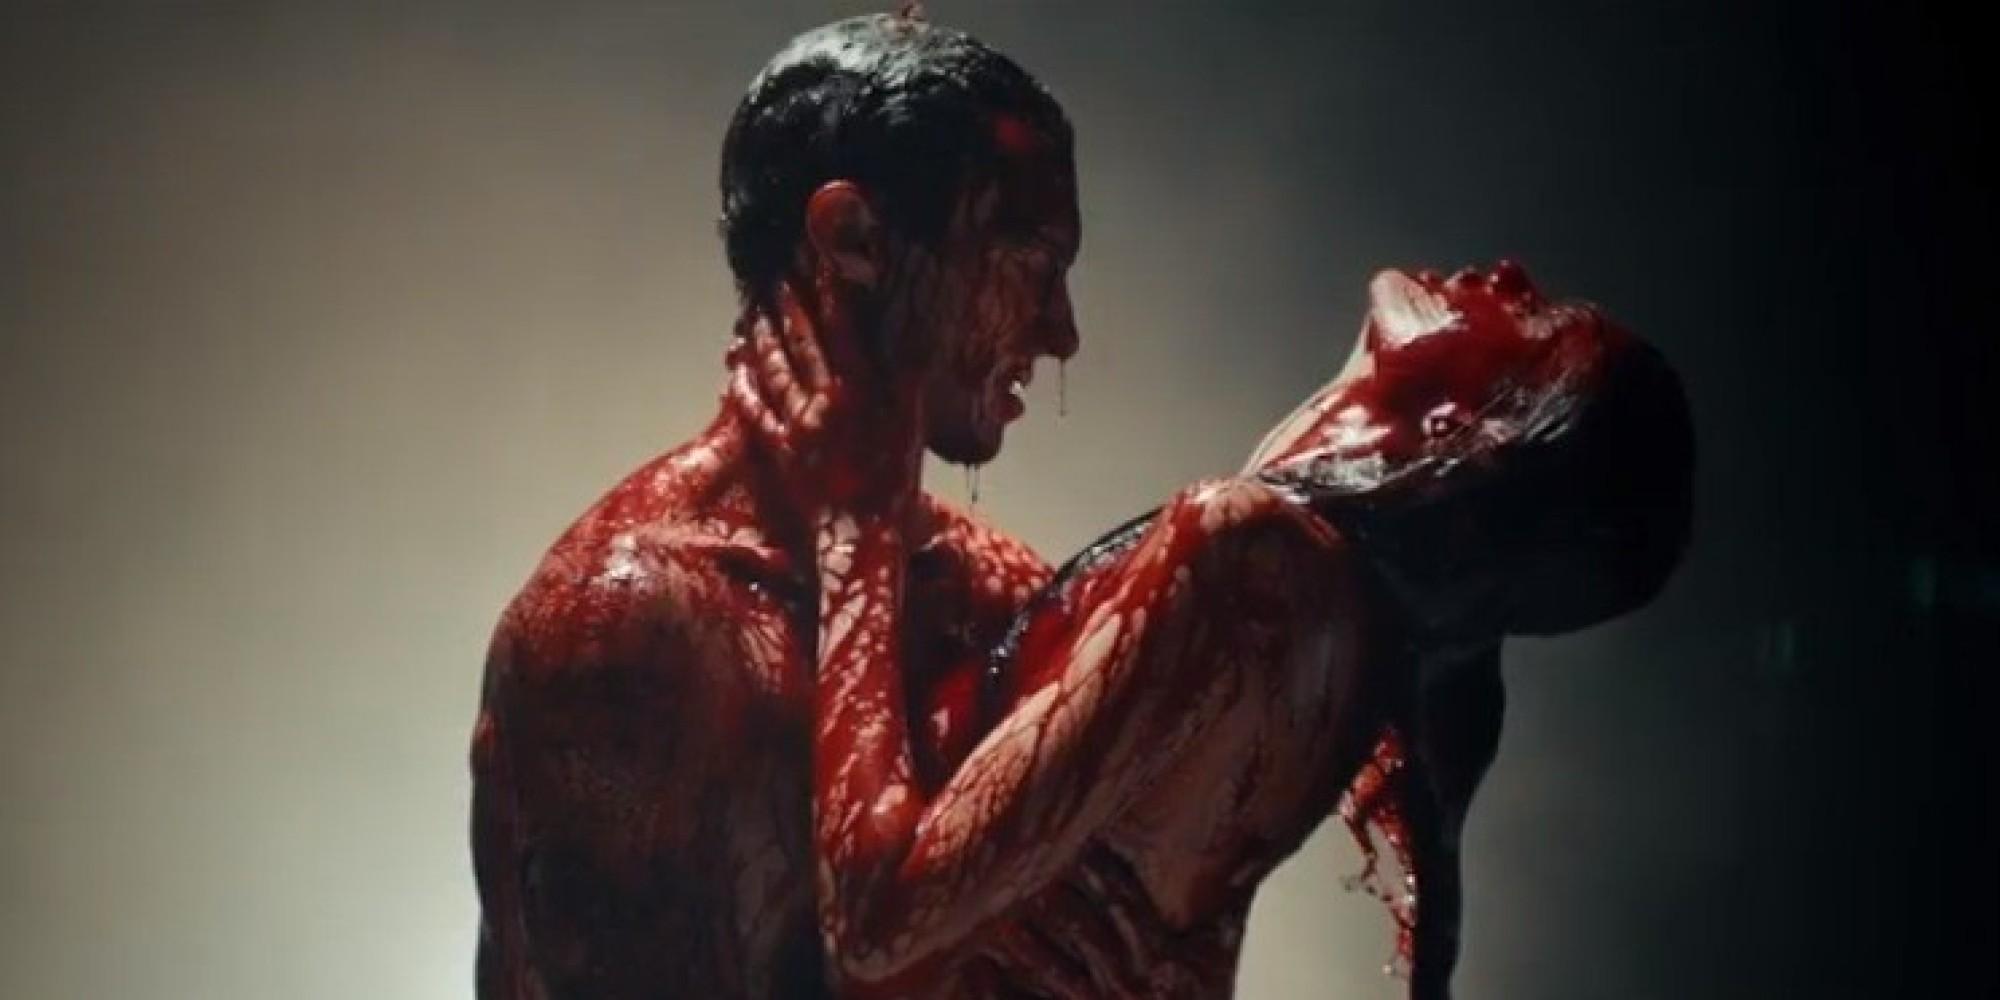 maroon 5 video for animals stars adam levine as butcher